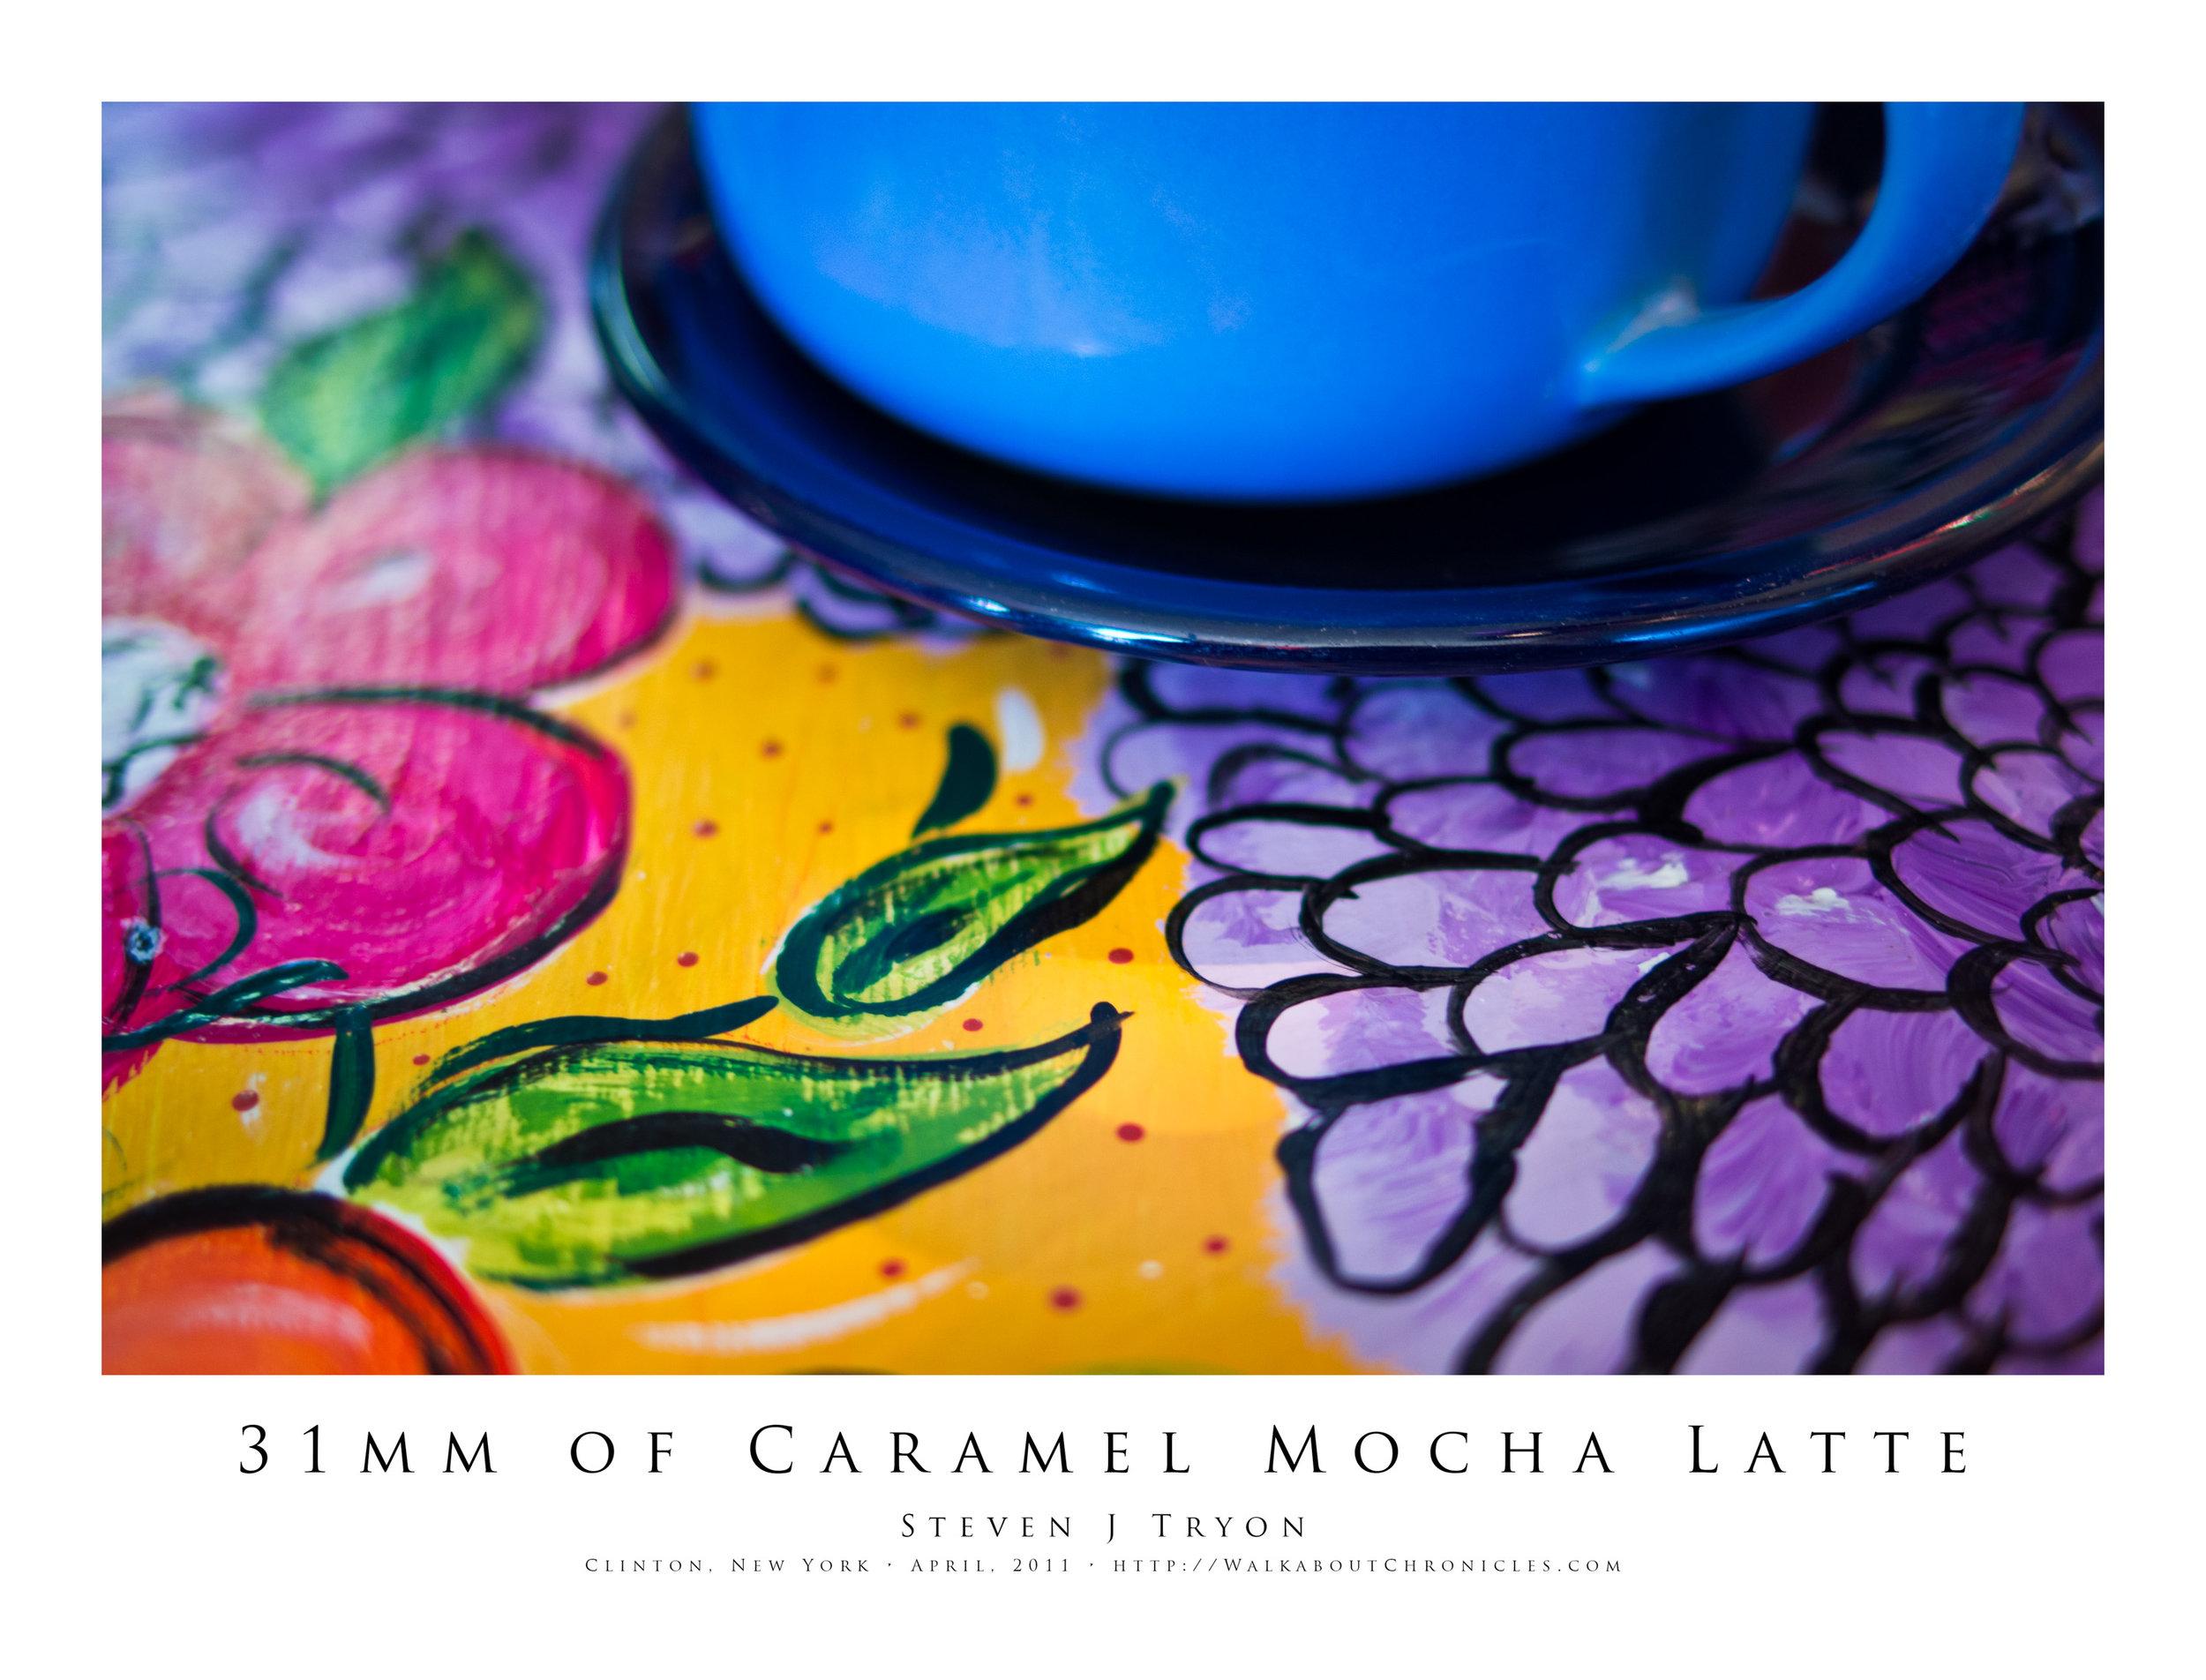 31mm of Caramel Mocha Latte